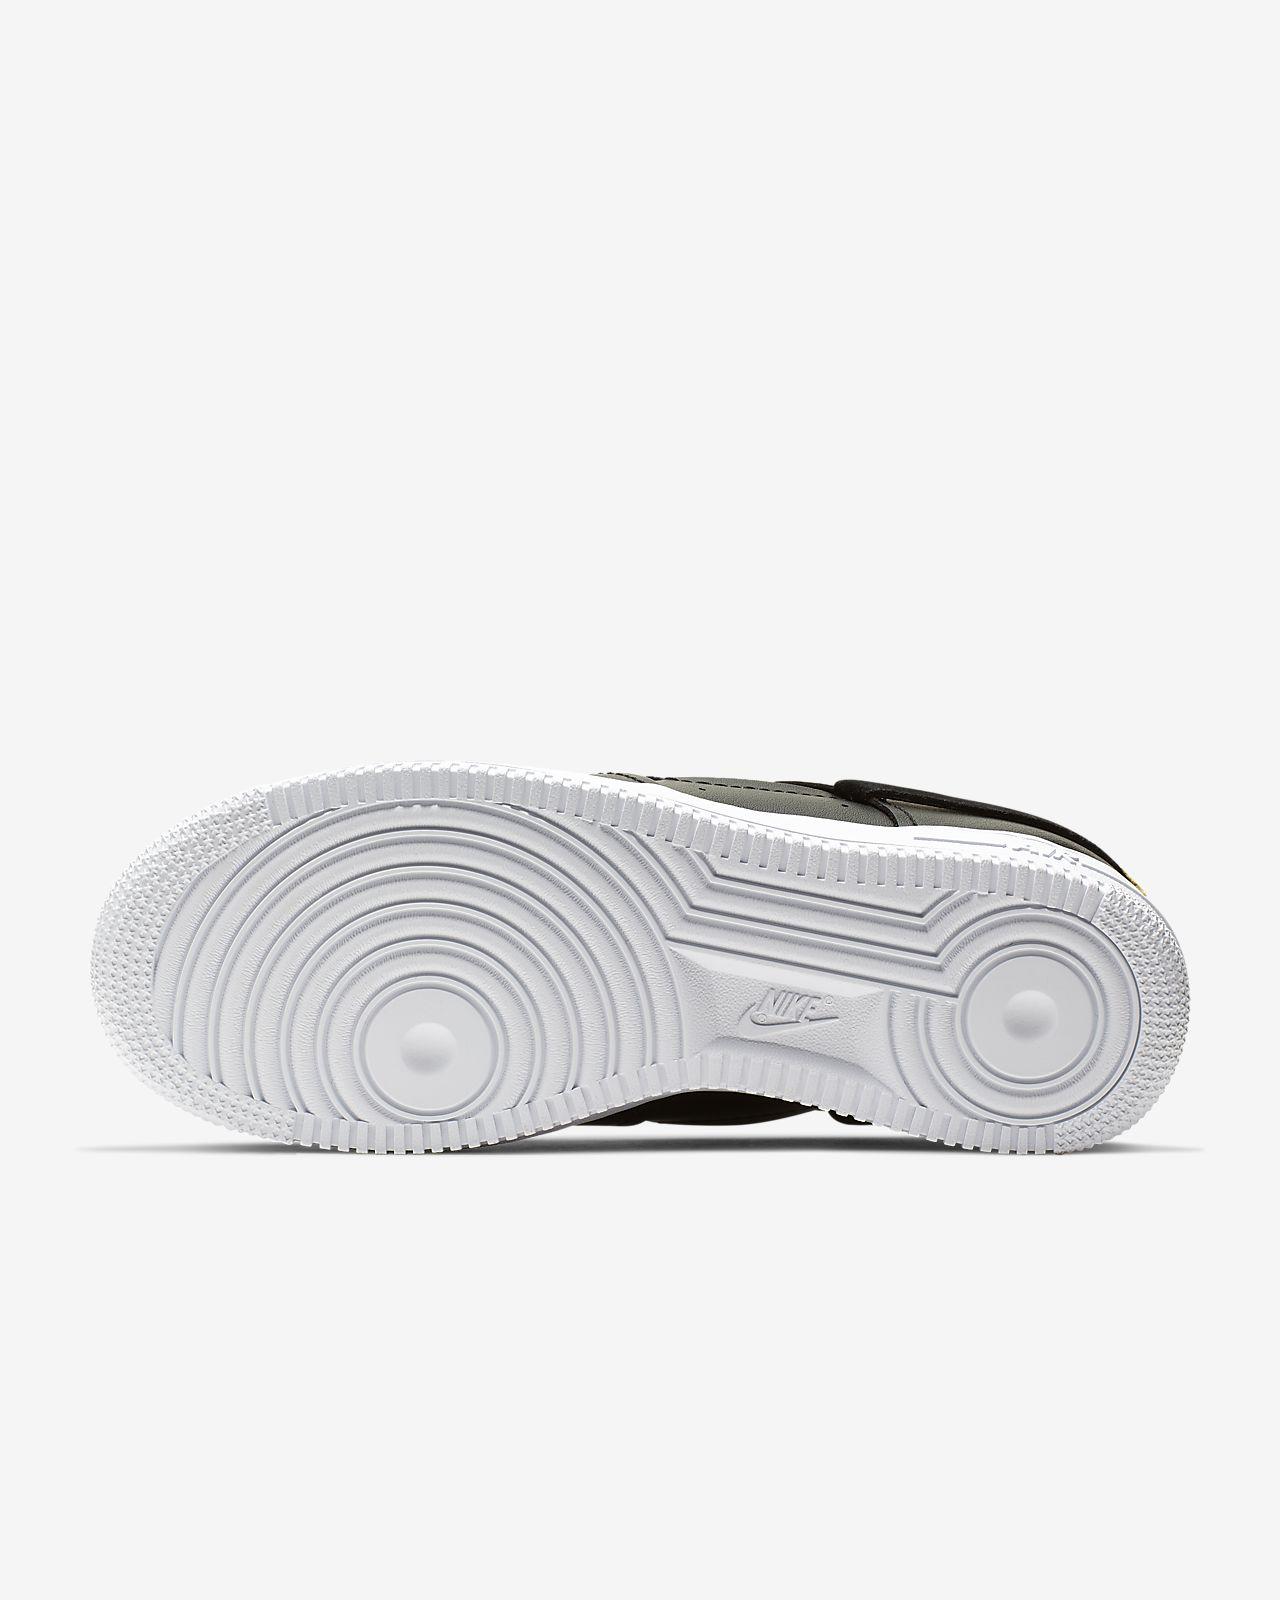 Nike WMNS Air Force 1 '07 Lux (weiß rot) 898889 101 | 43einhalb Sneaker Store